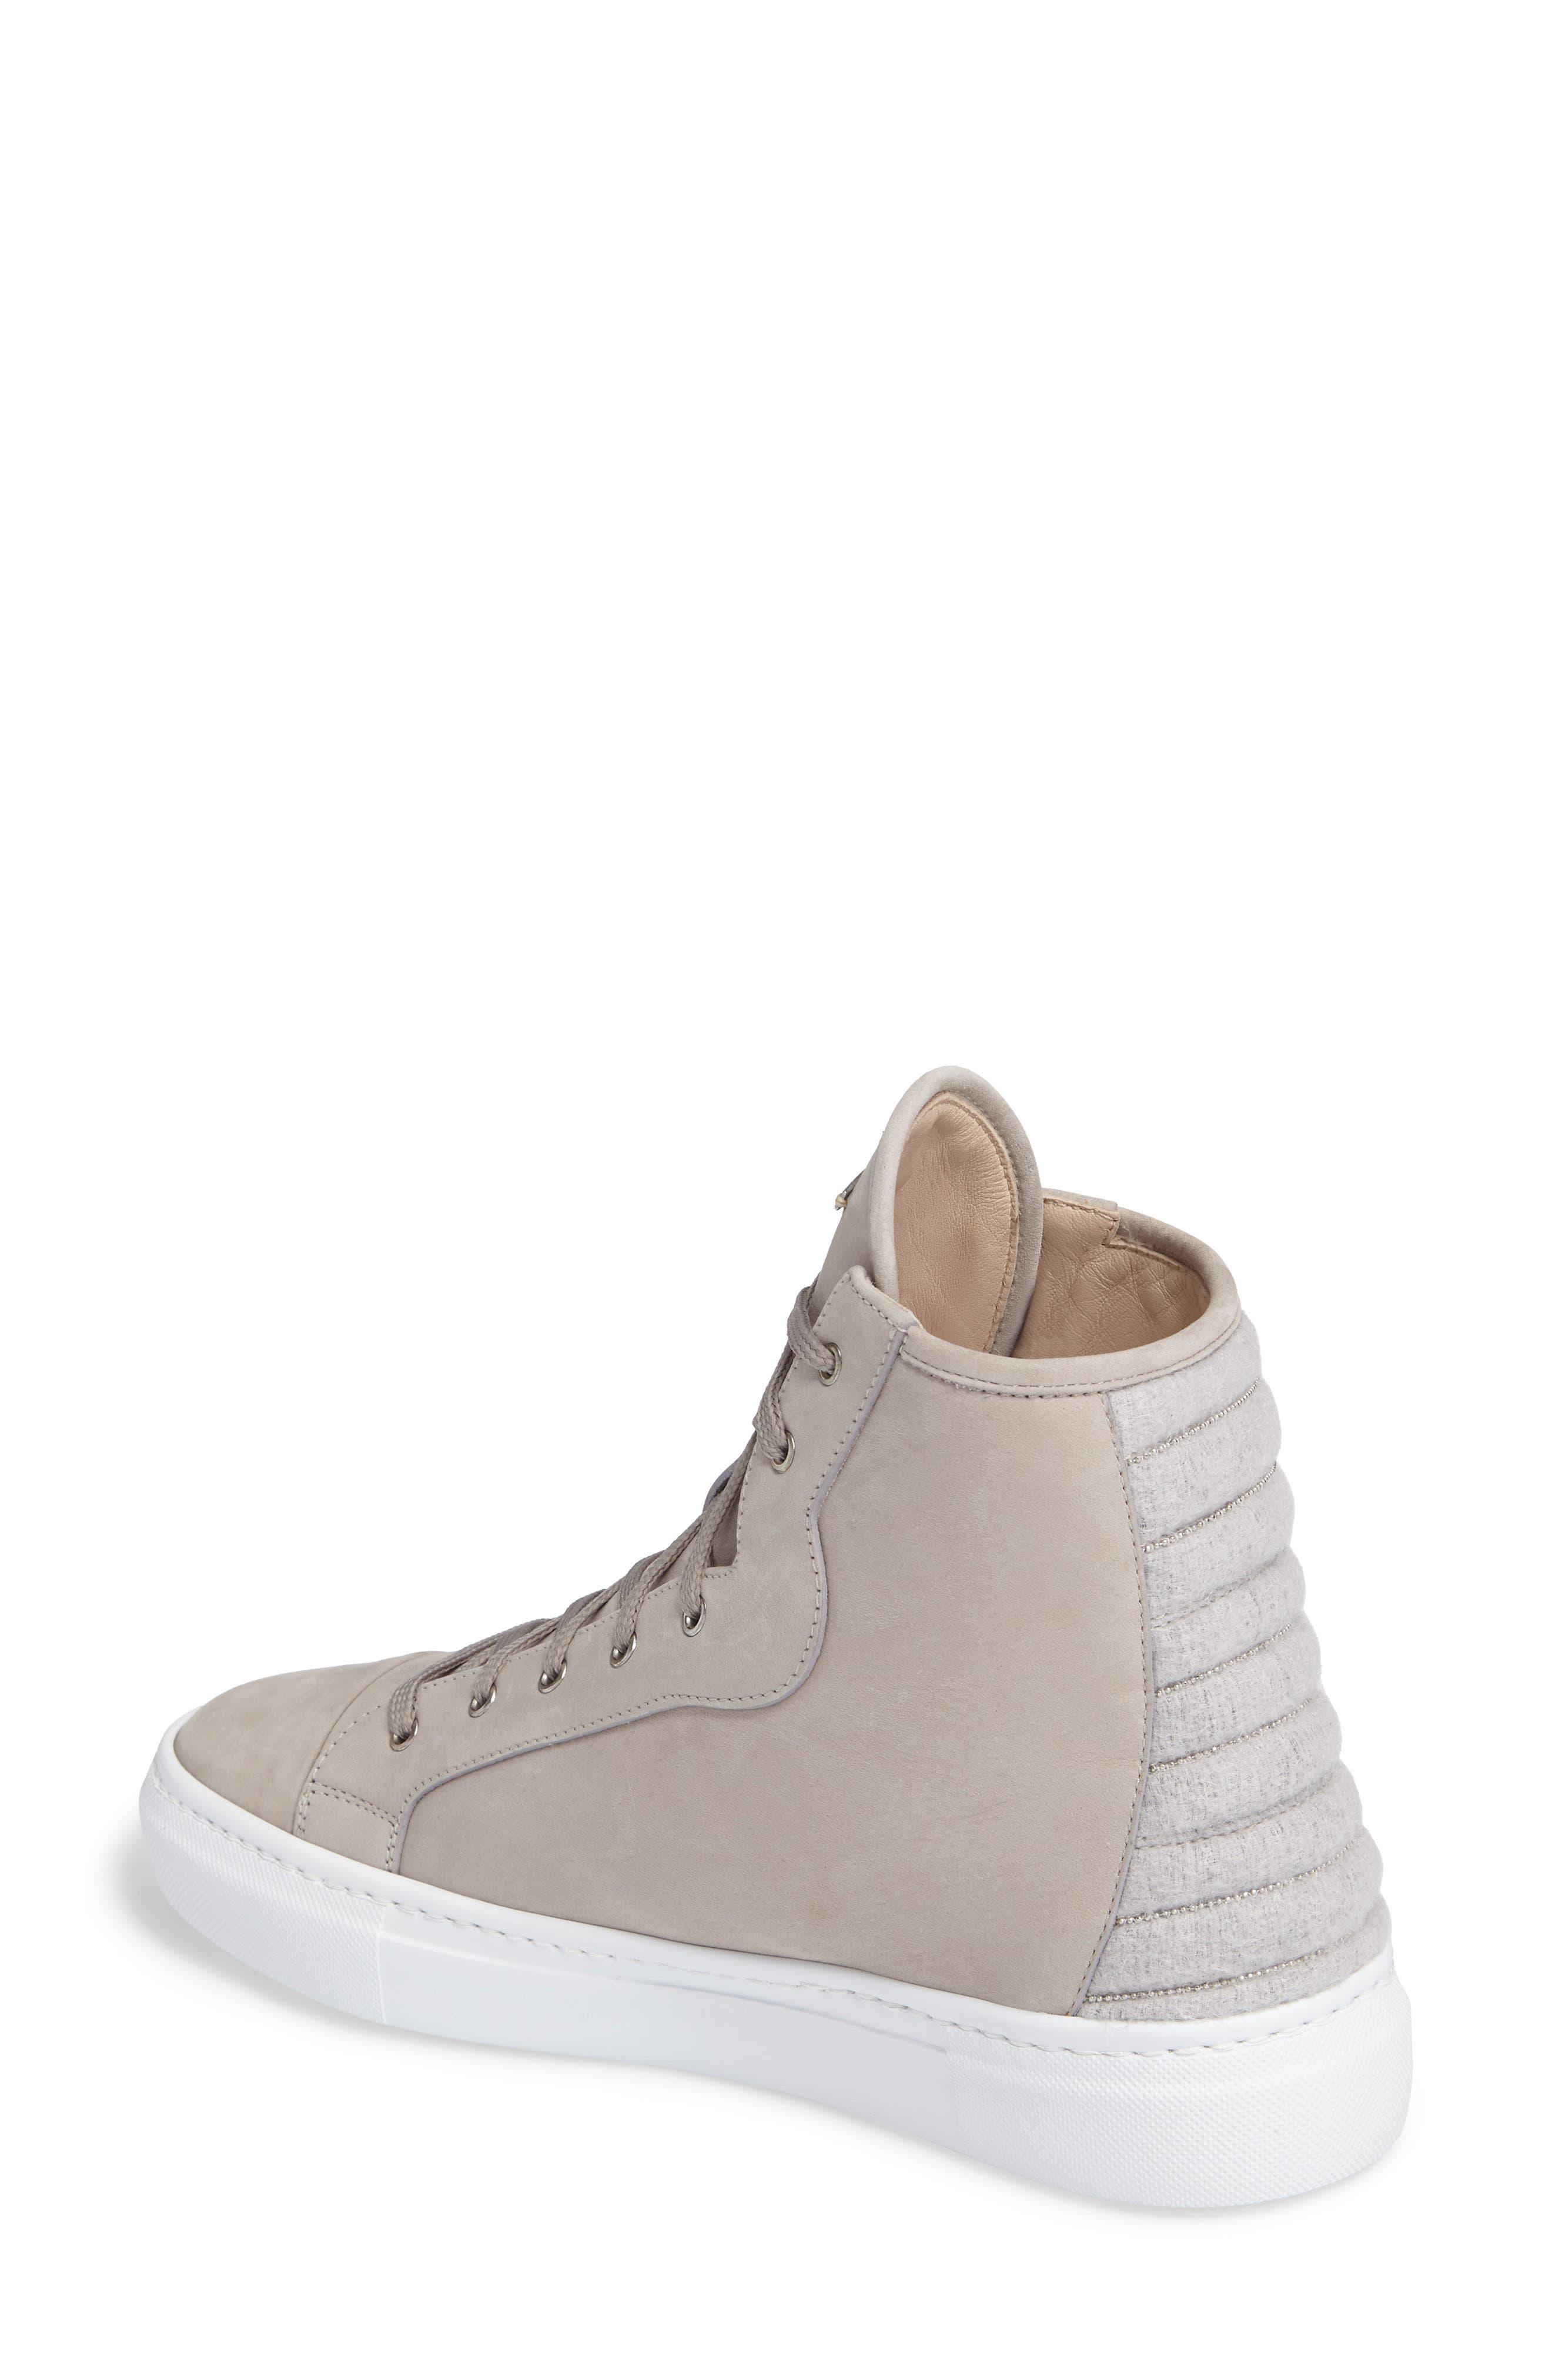 Eva High Top Sneaker,                             Alternate thumbnail 2, color,                             250